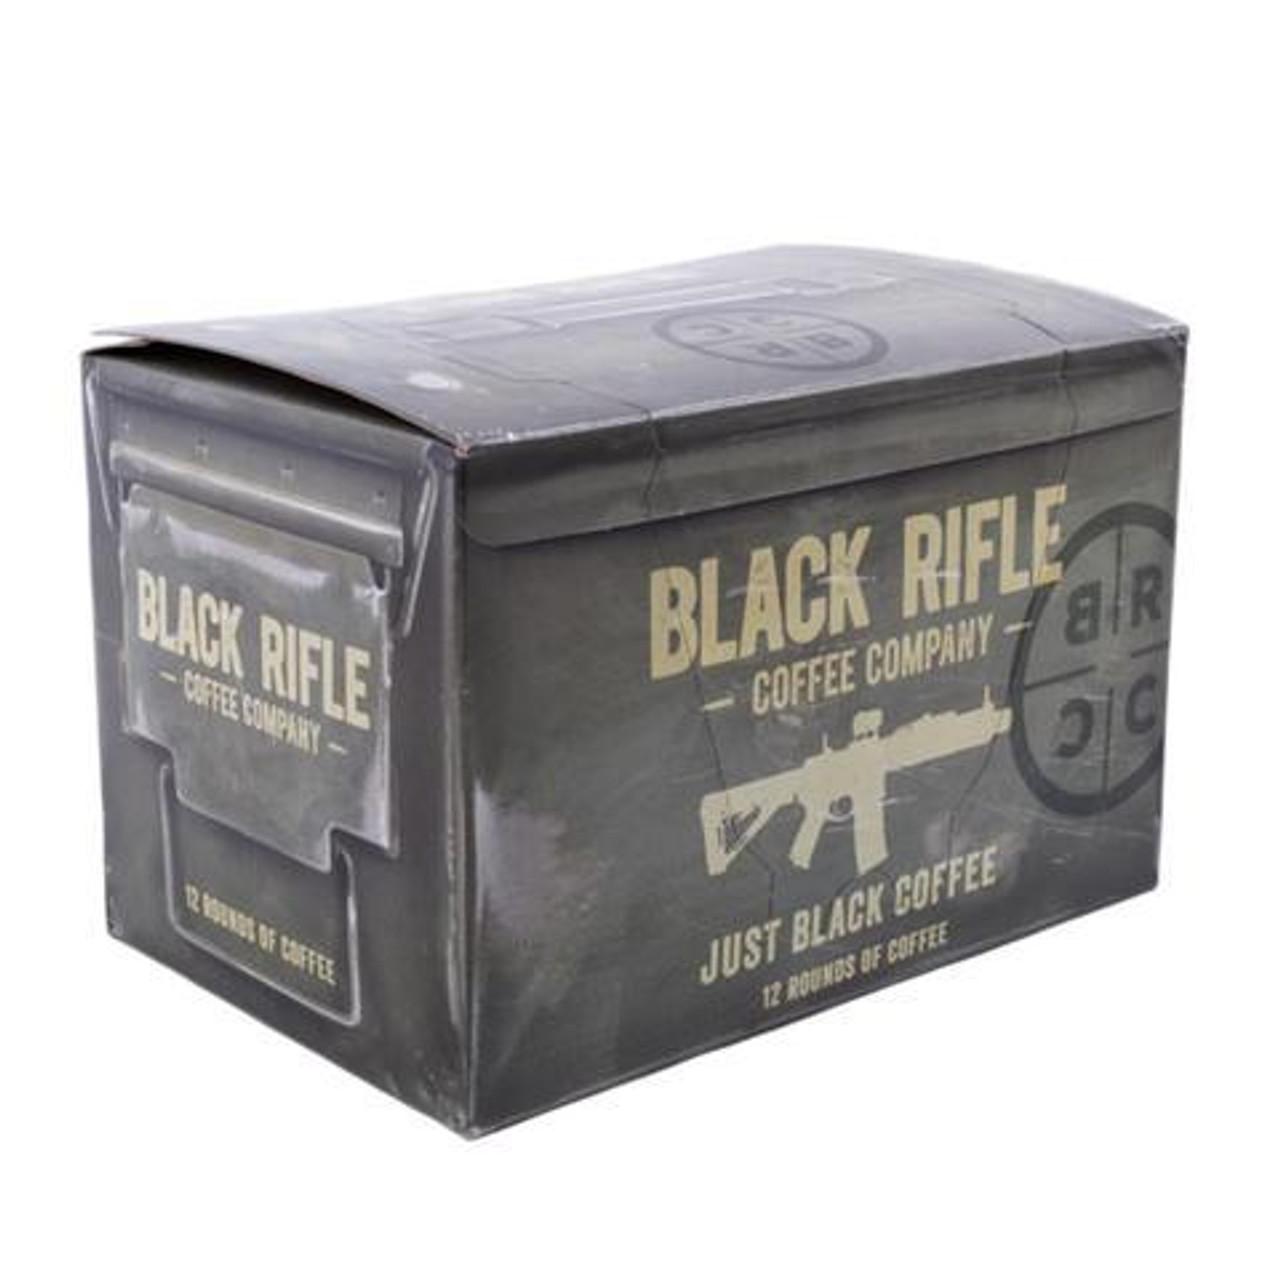 Black Rifle Coffee - JUST BLACK COFFEE ROUNDS